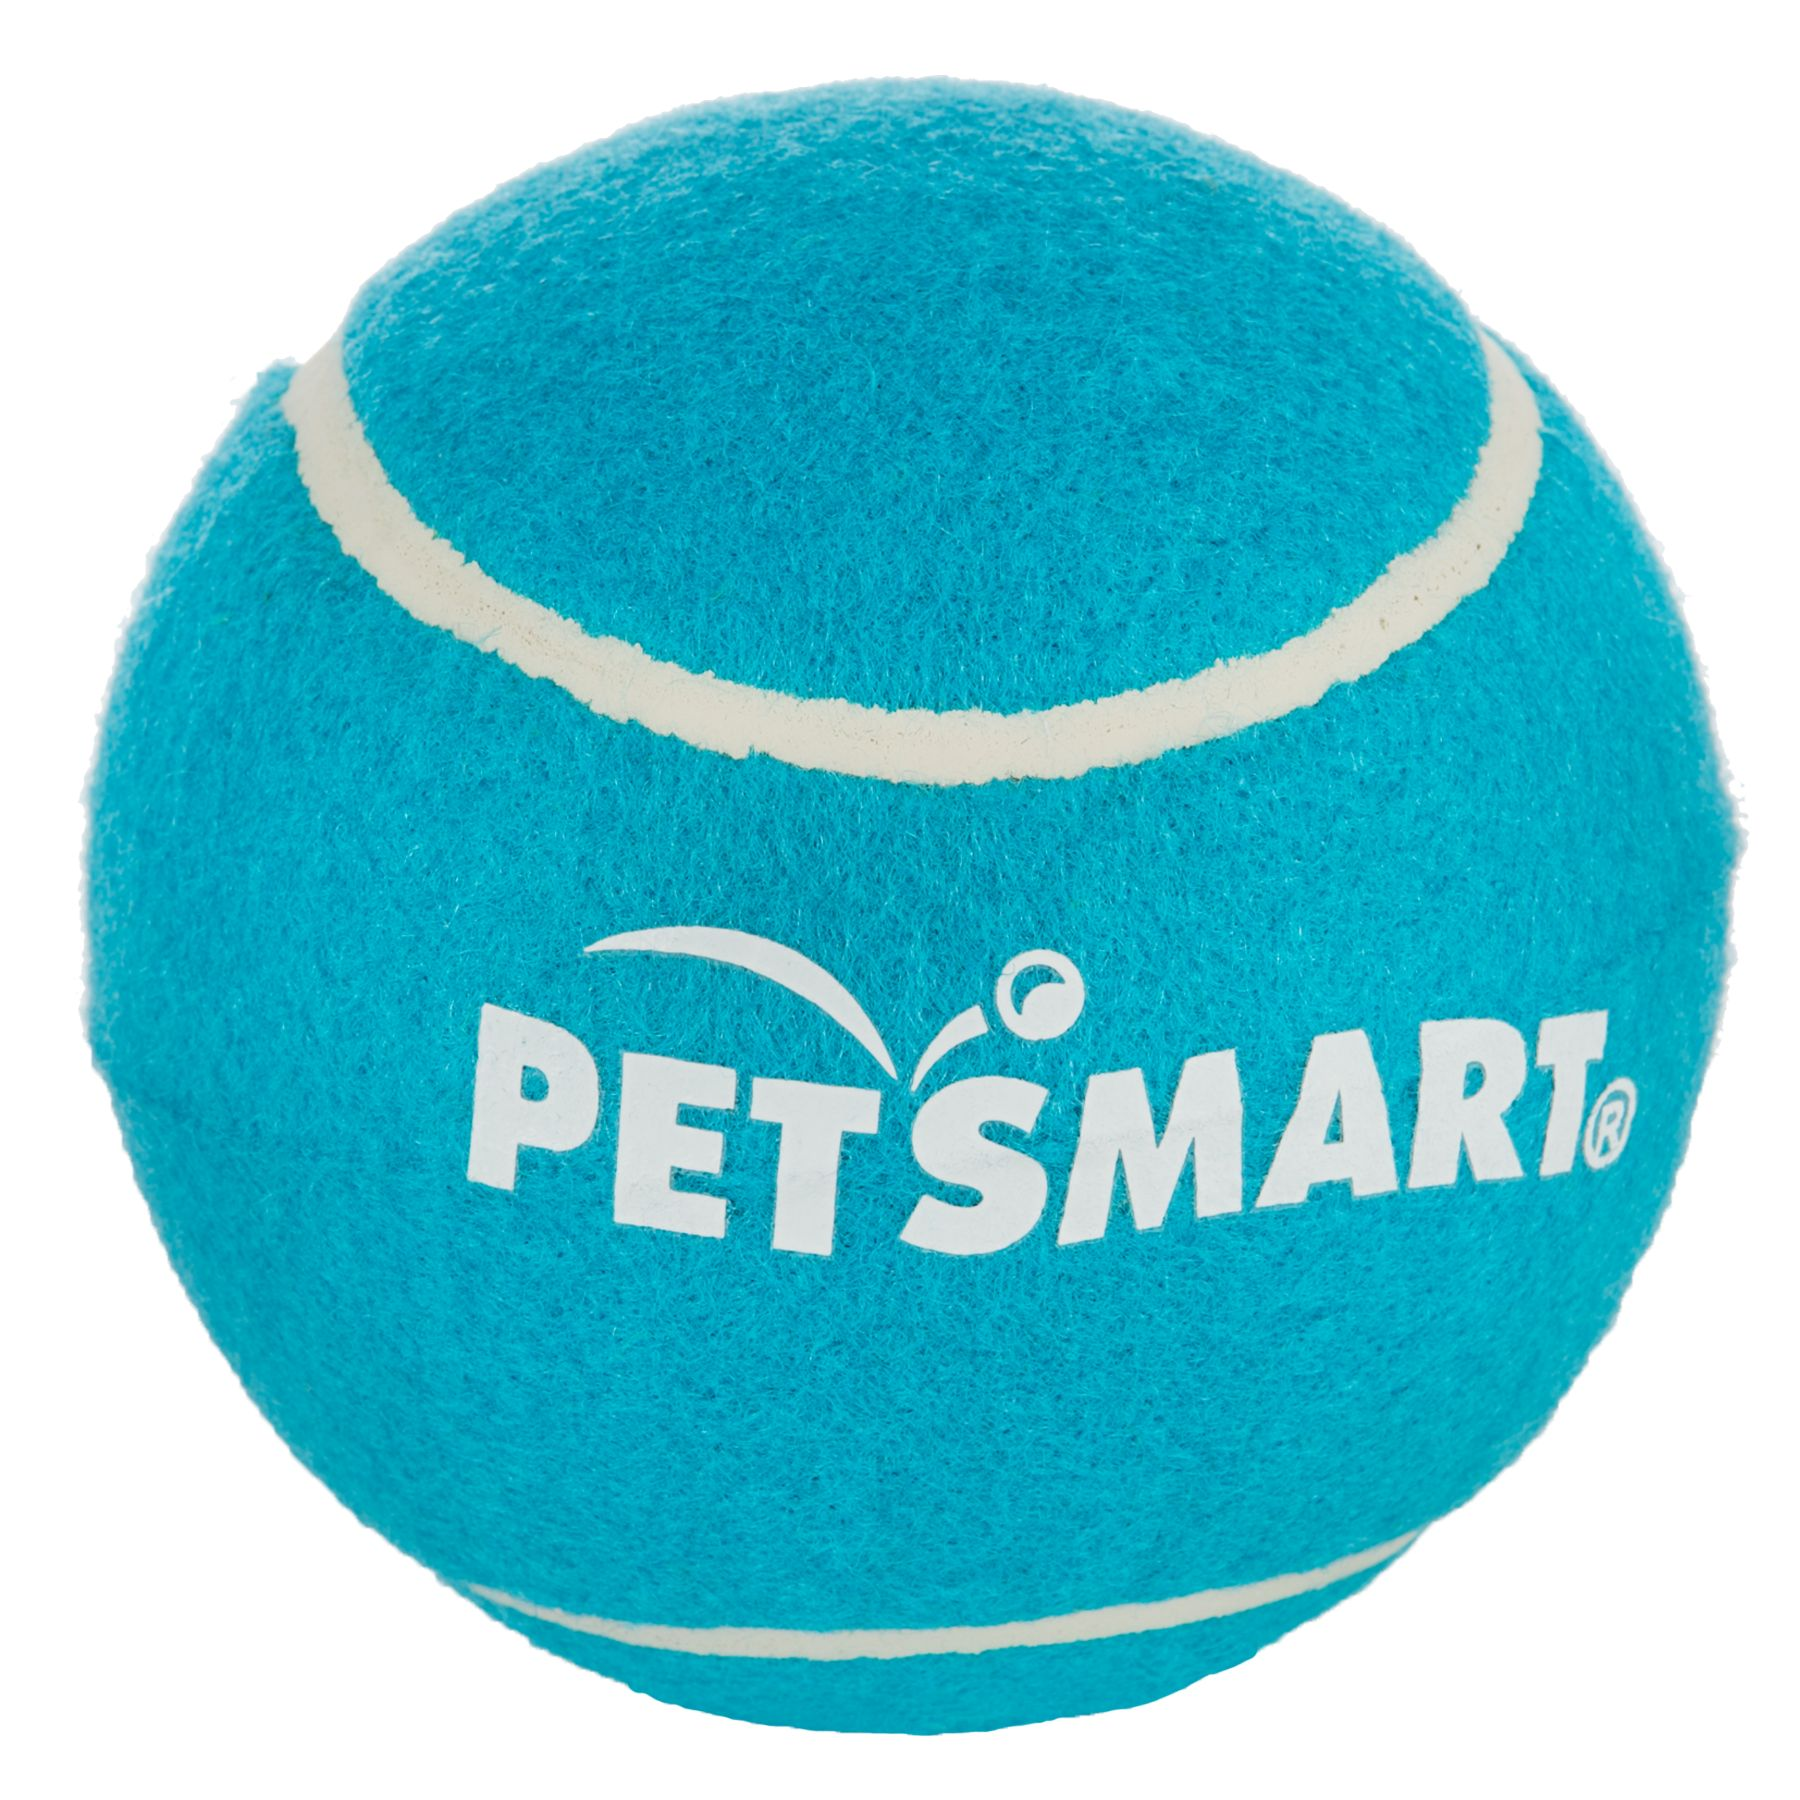 Grreat Choice Petsmart Giant Tennis Ball Blue